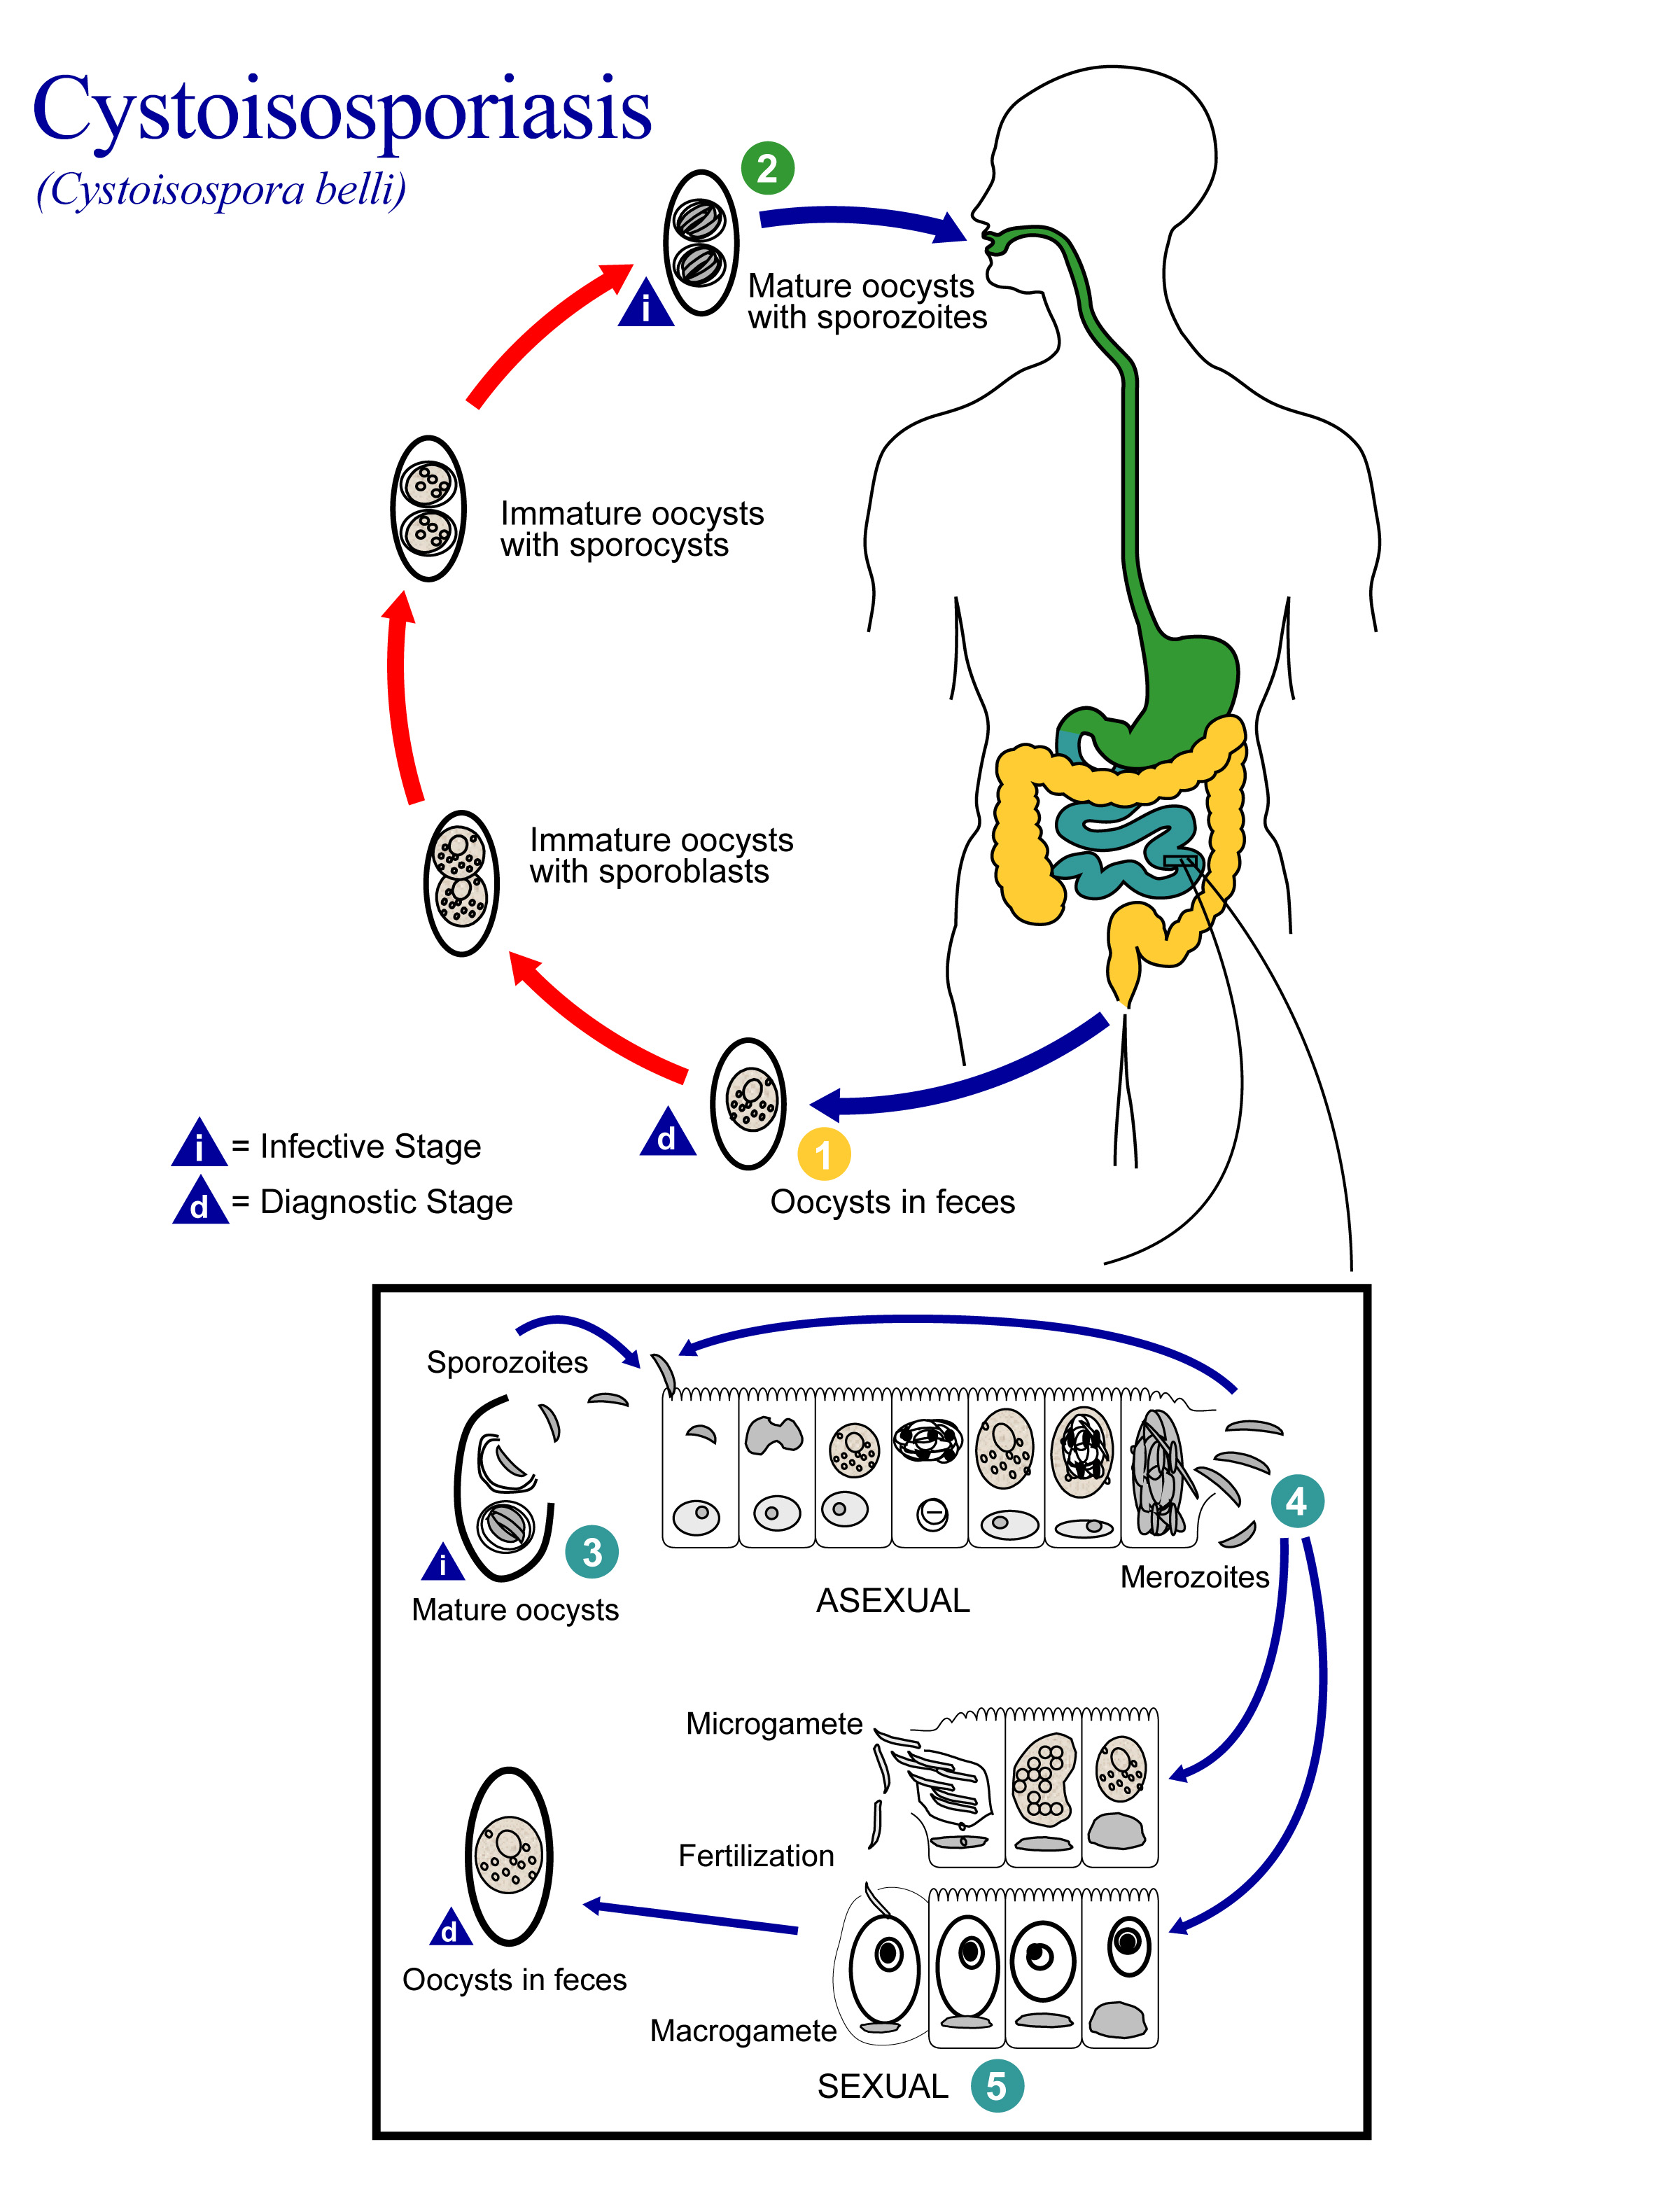 https://www.msdmanuals.com/-/media/manual/professional/images/inf-cystoisosporiasis-lifecycle.jpg?thn=0&sc_lang=en